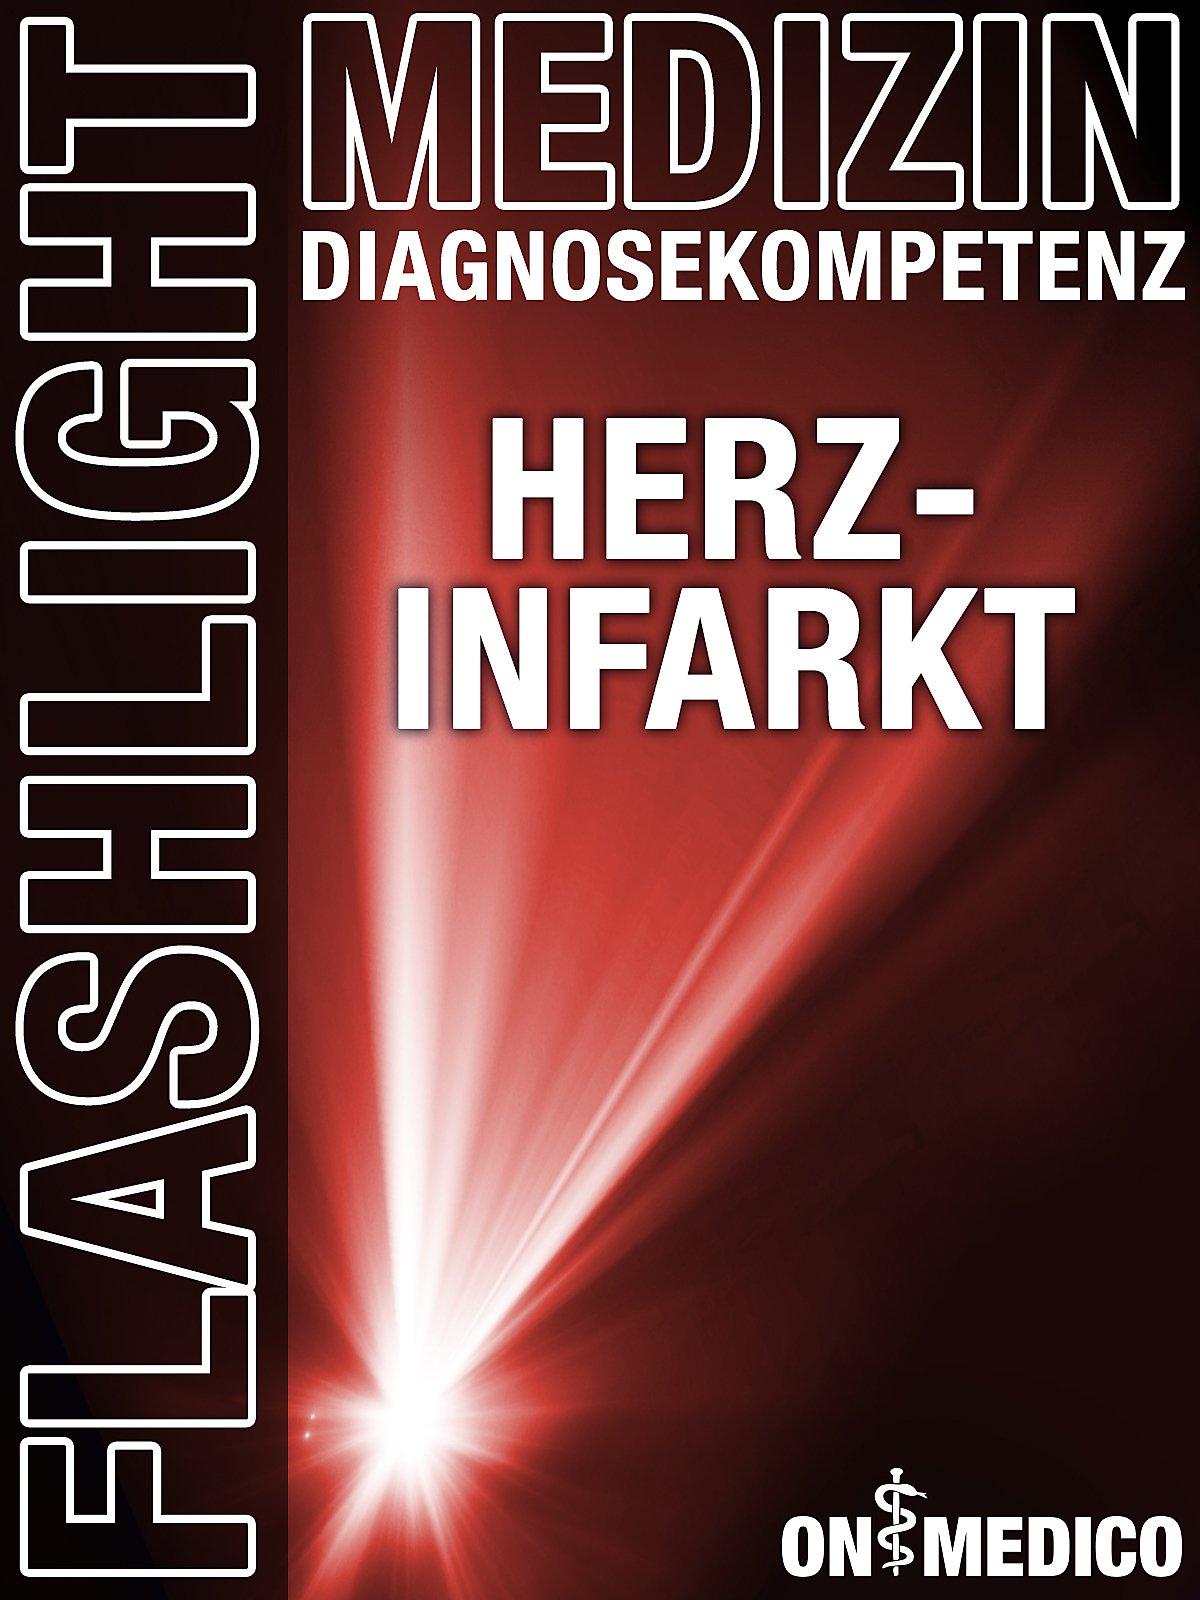 flashlight medizin herzrhytmusstorungen diagnosekompetenz